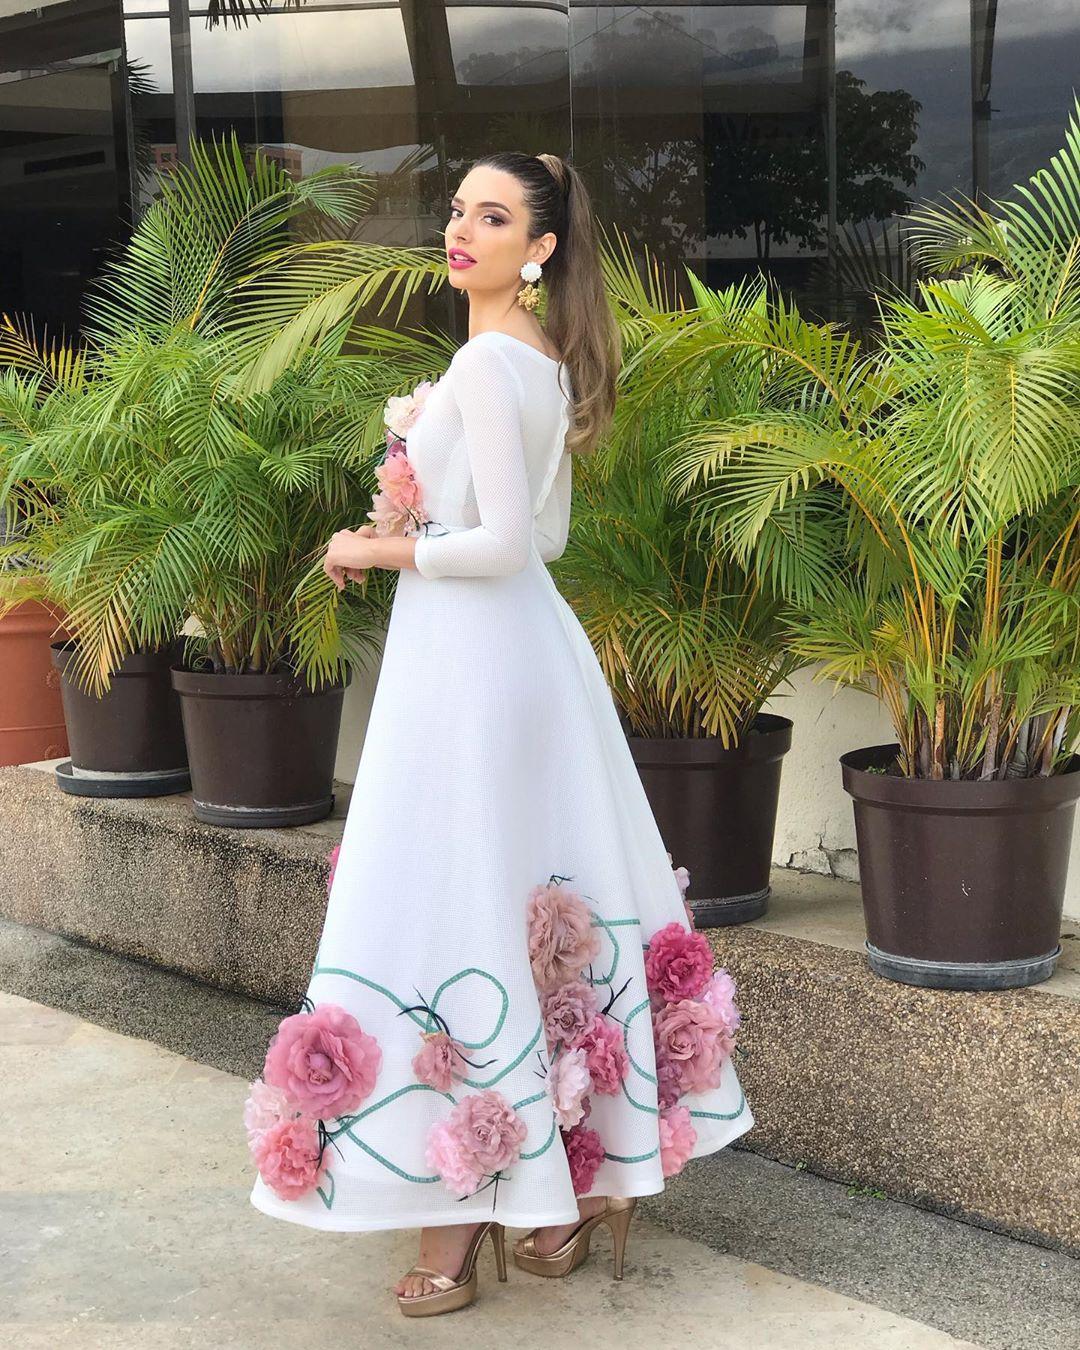 ainara de santamaria villamor, top 21 de miss grand international 2019/miss world cantabria 2018/miss earth spain 2017. - Página 17 72412410